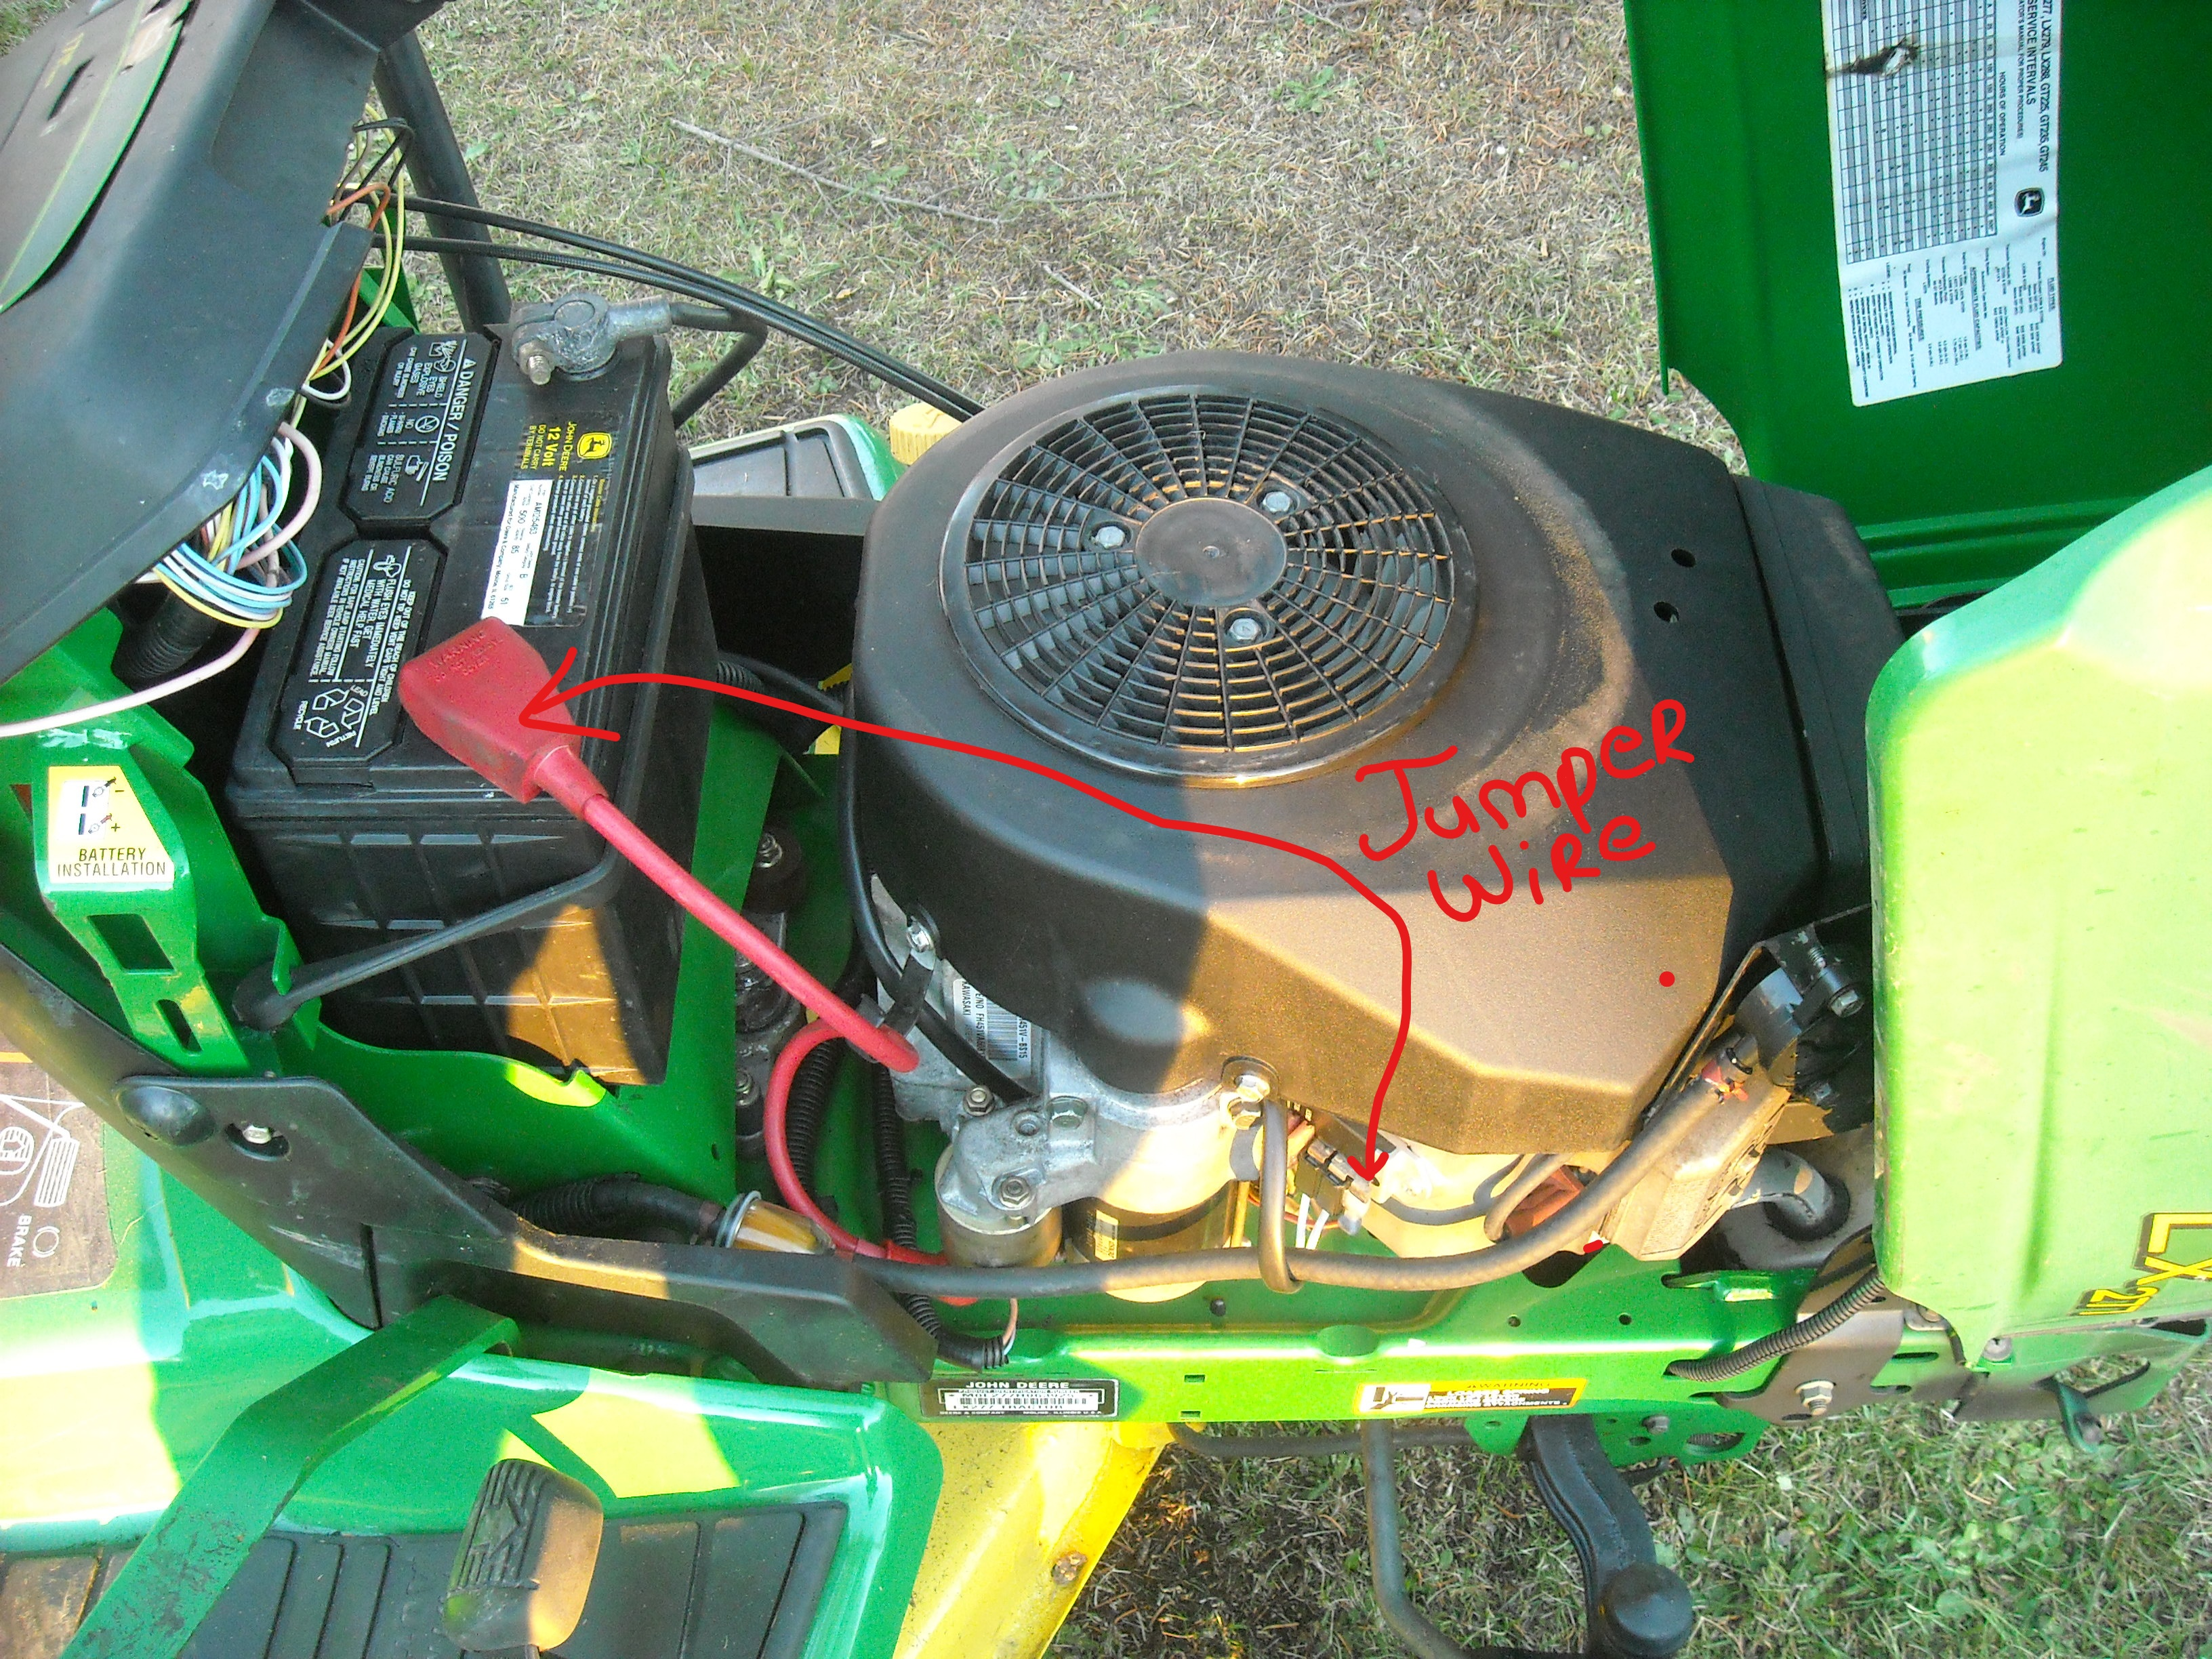 Lx277 Wiring Diagram Gt242 Lx178 John Deere Charging Problems Nemetasaufgegabeltinfo On